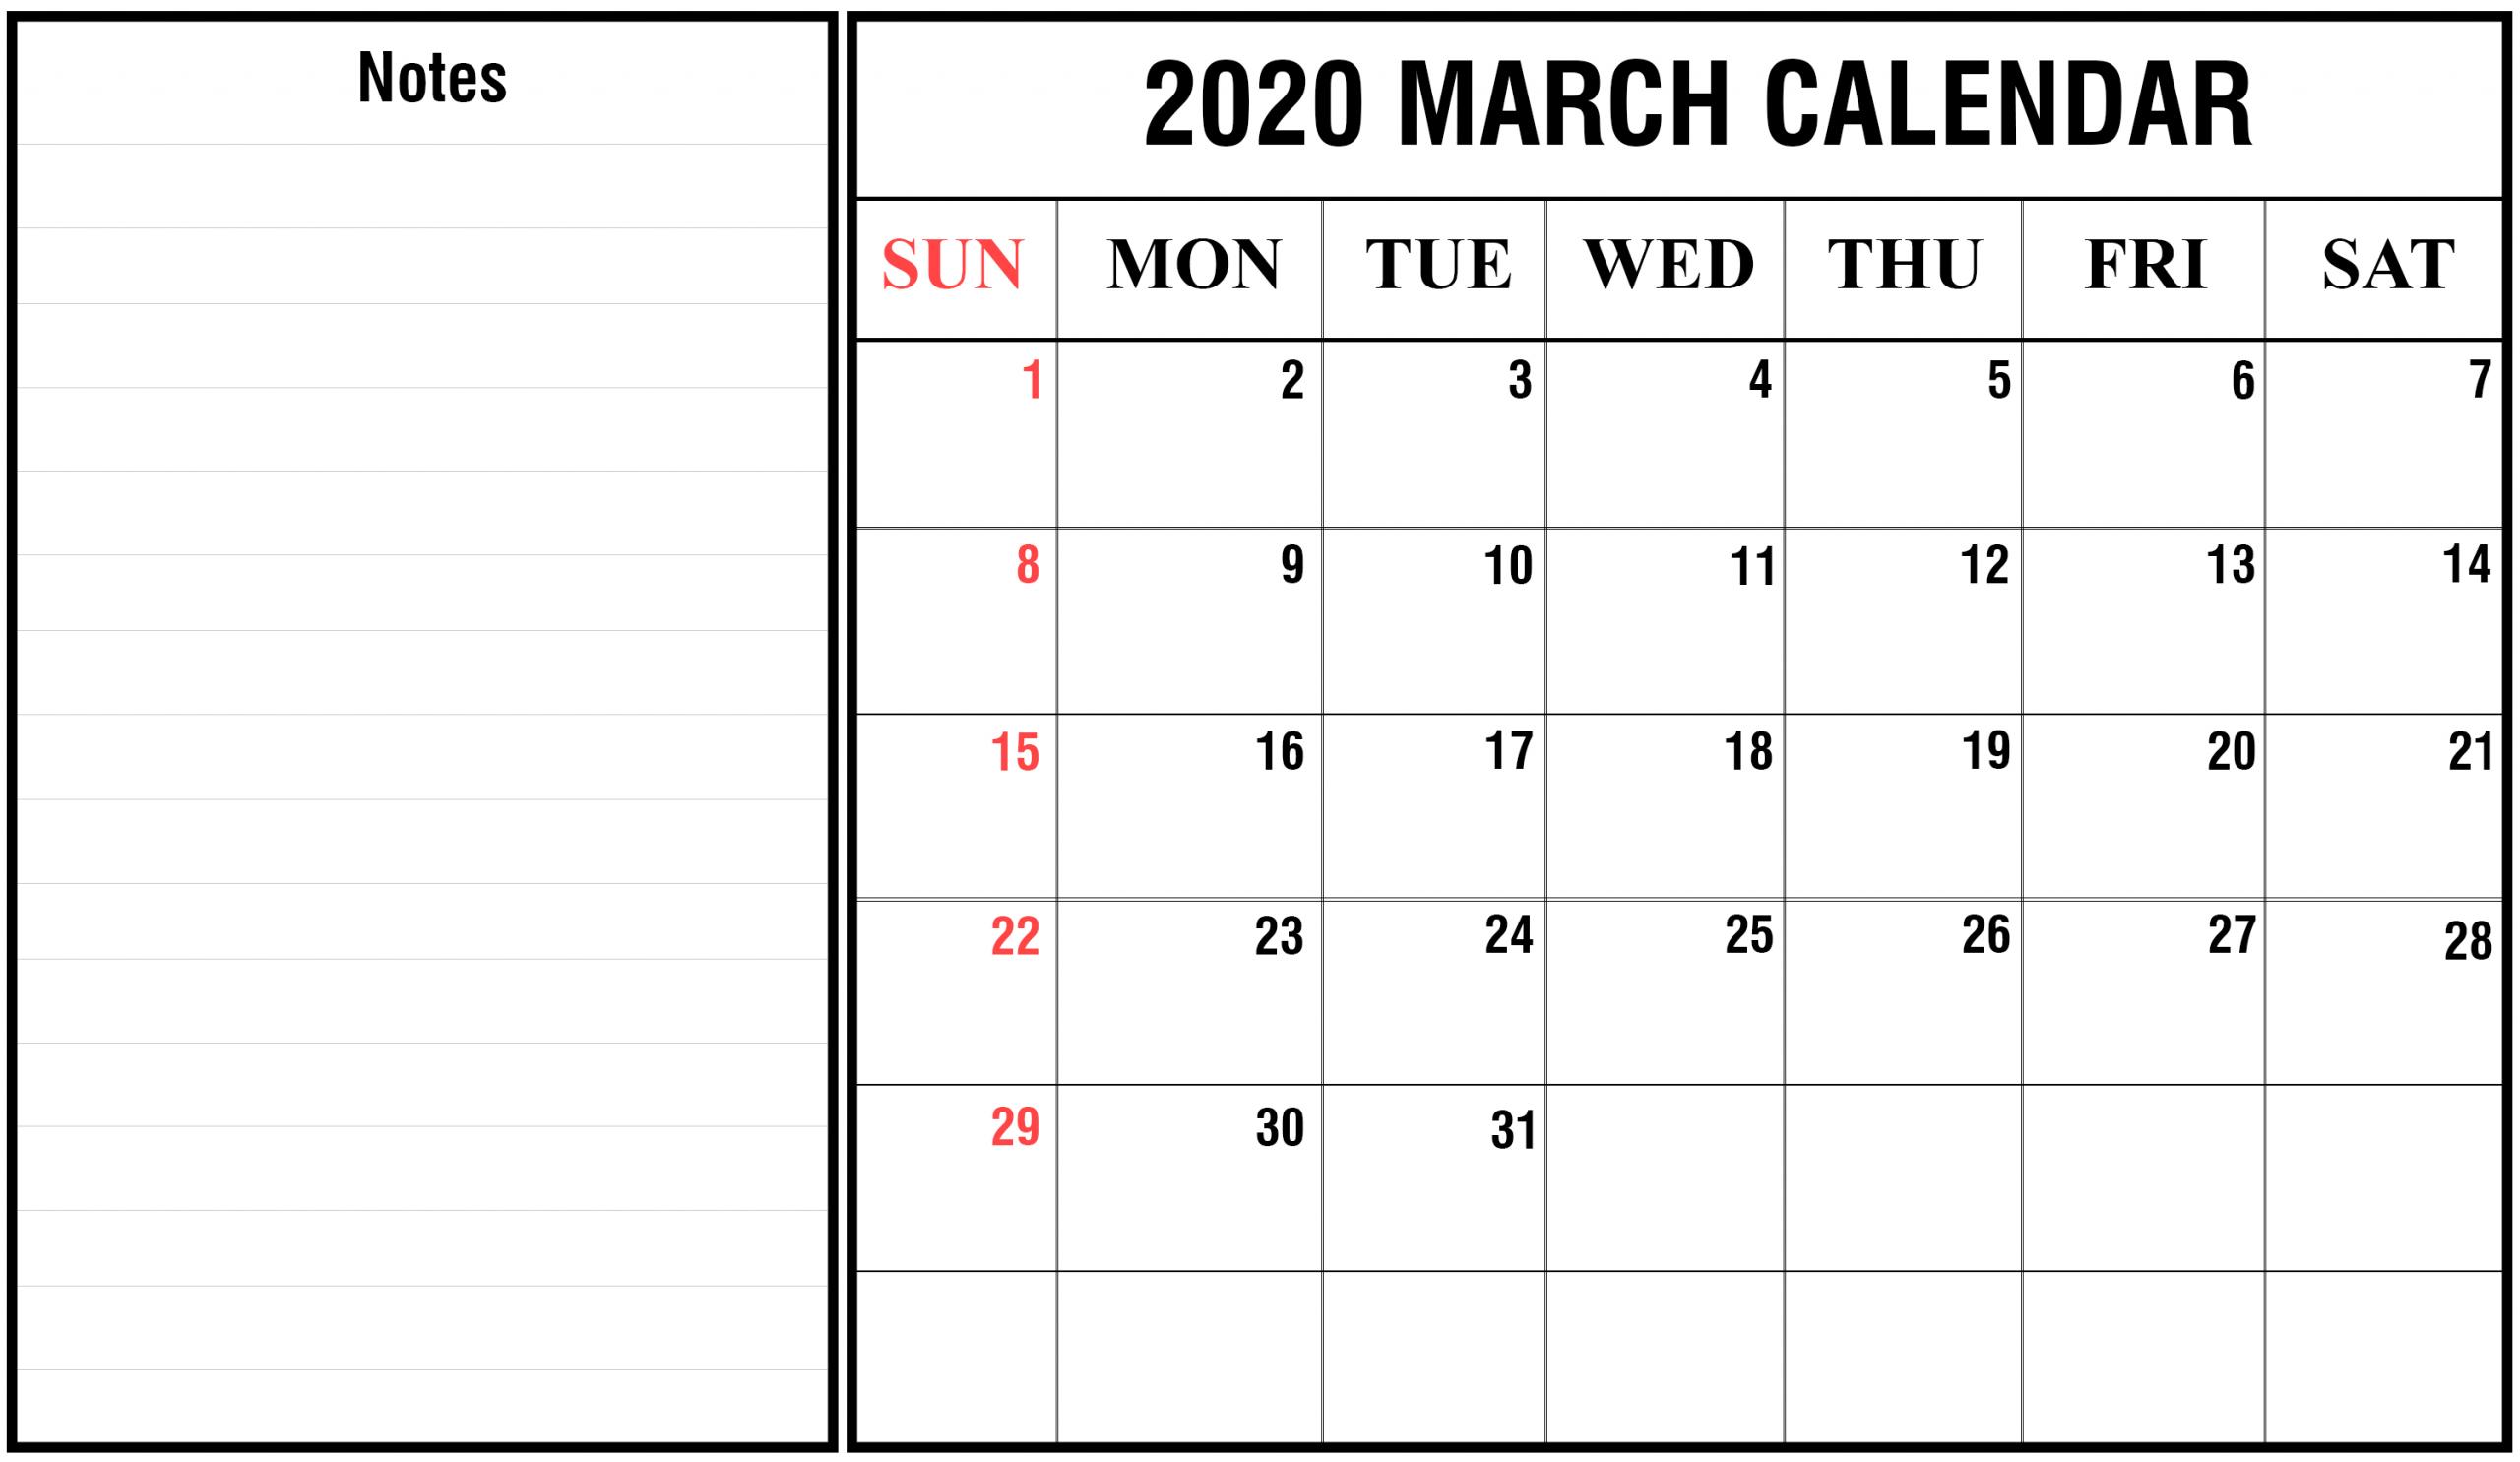 2020 Calendar You Can Edit | Calendar Template Printable Calanda Templete That I Can Edit